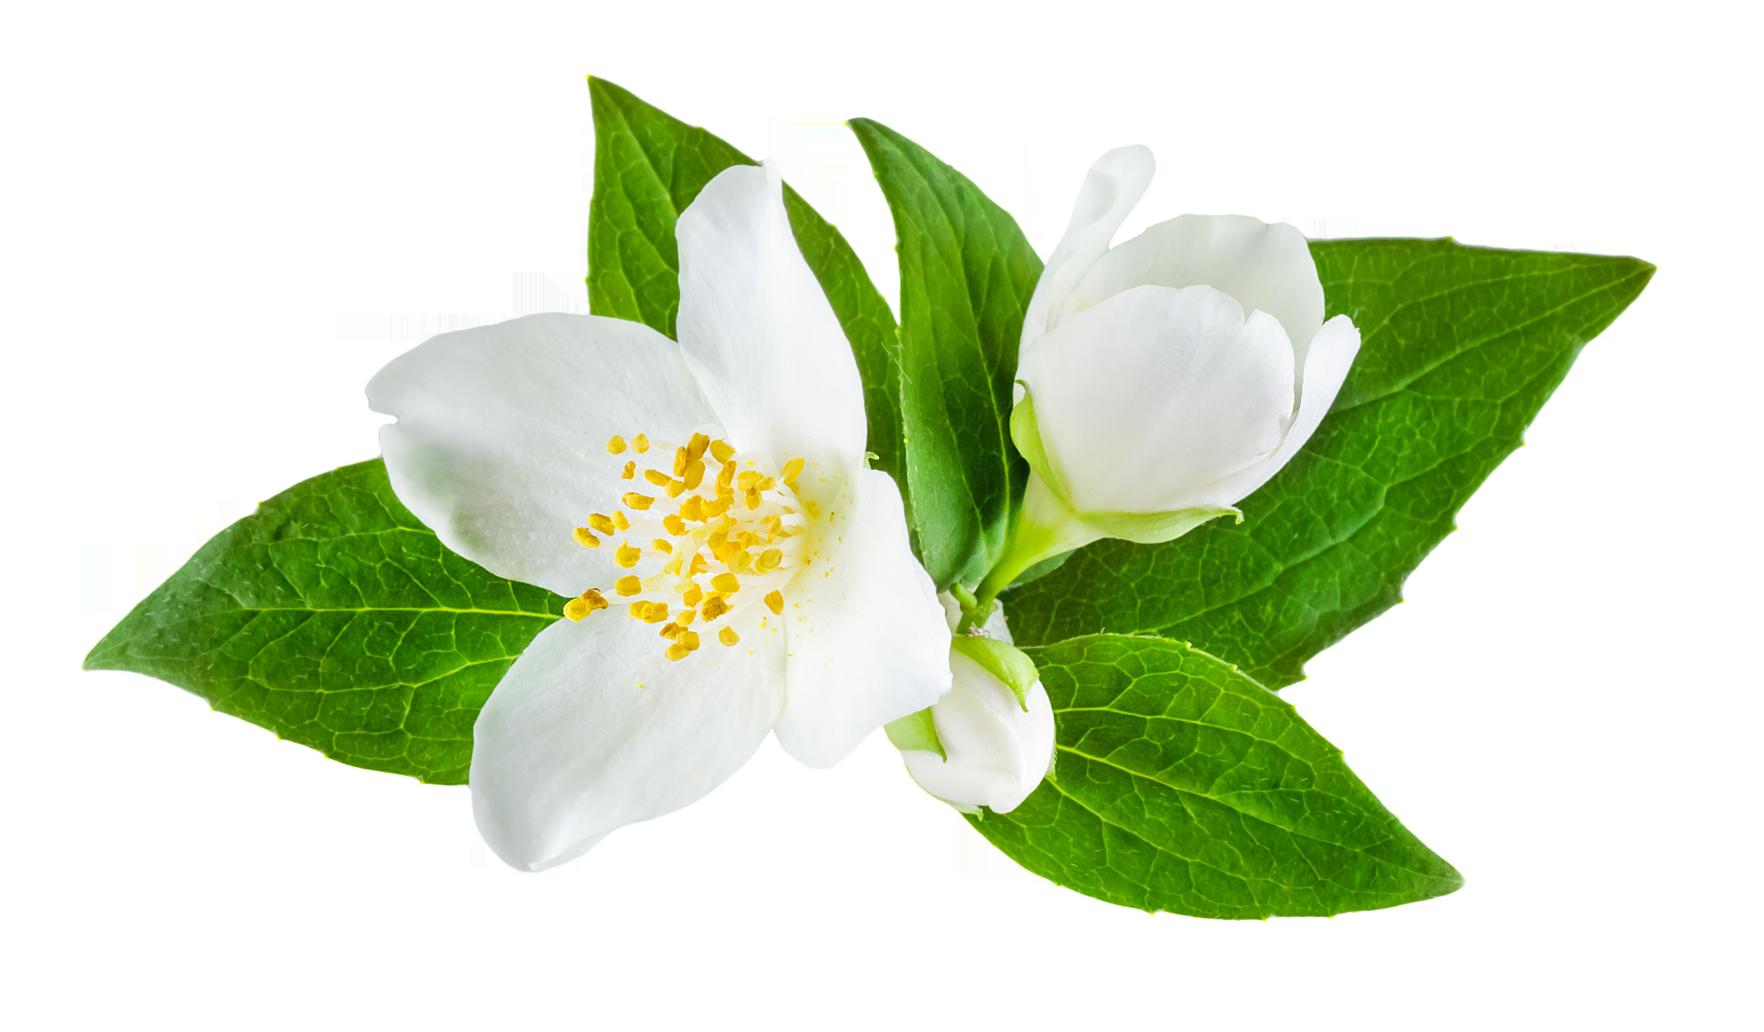 Green flower png. Jasmine images free download